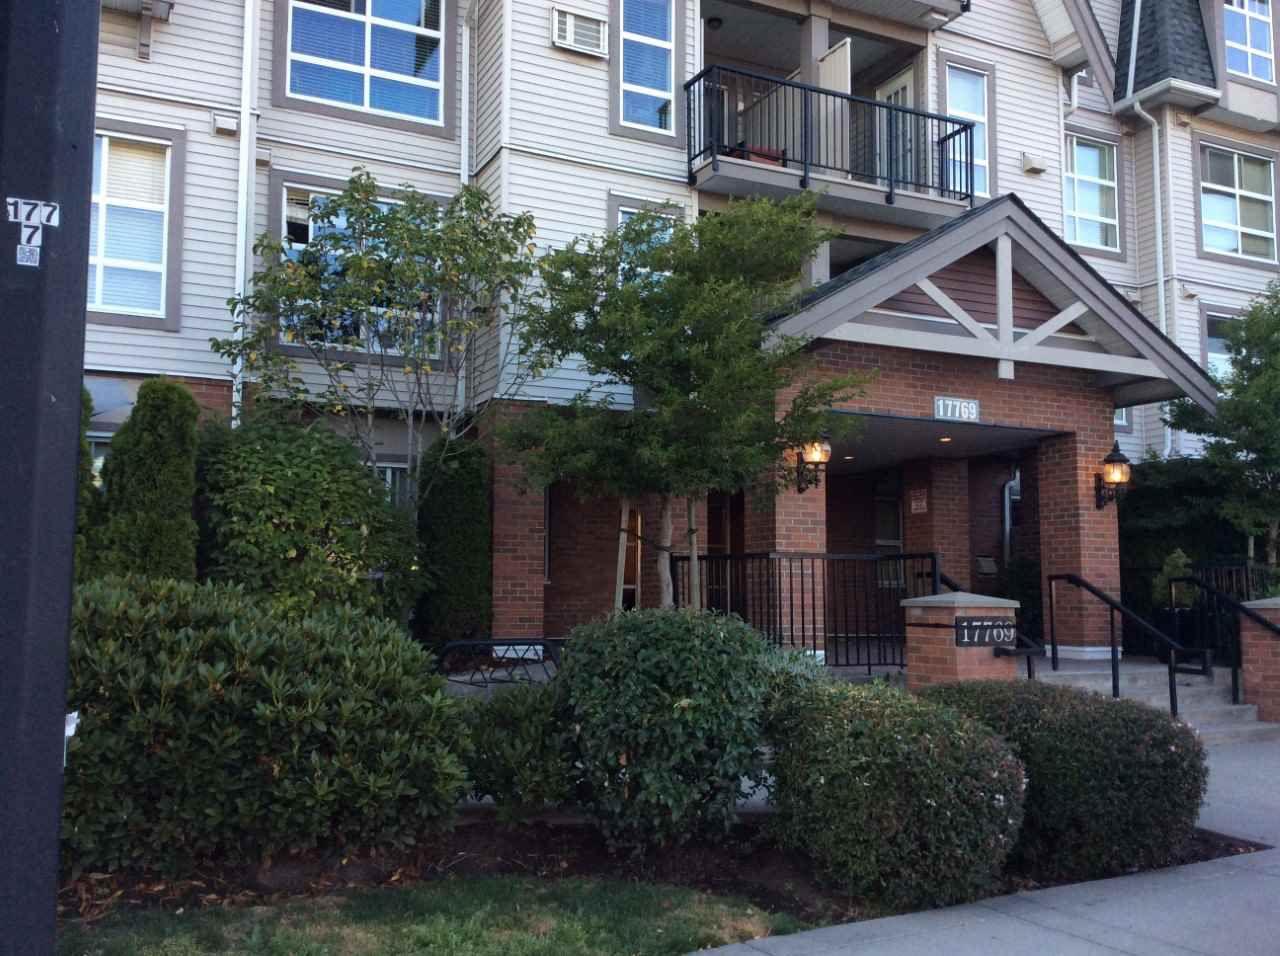 "Main Photo: 112 17769 57 Avenue in Surrey: Cloverdale BC Condo for sale in ""CLOVERDOWNS ESTATE"" (Cloverdale)  : MLS®# R2192961"